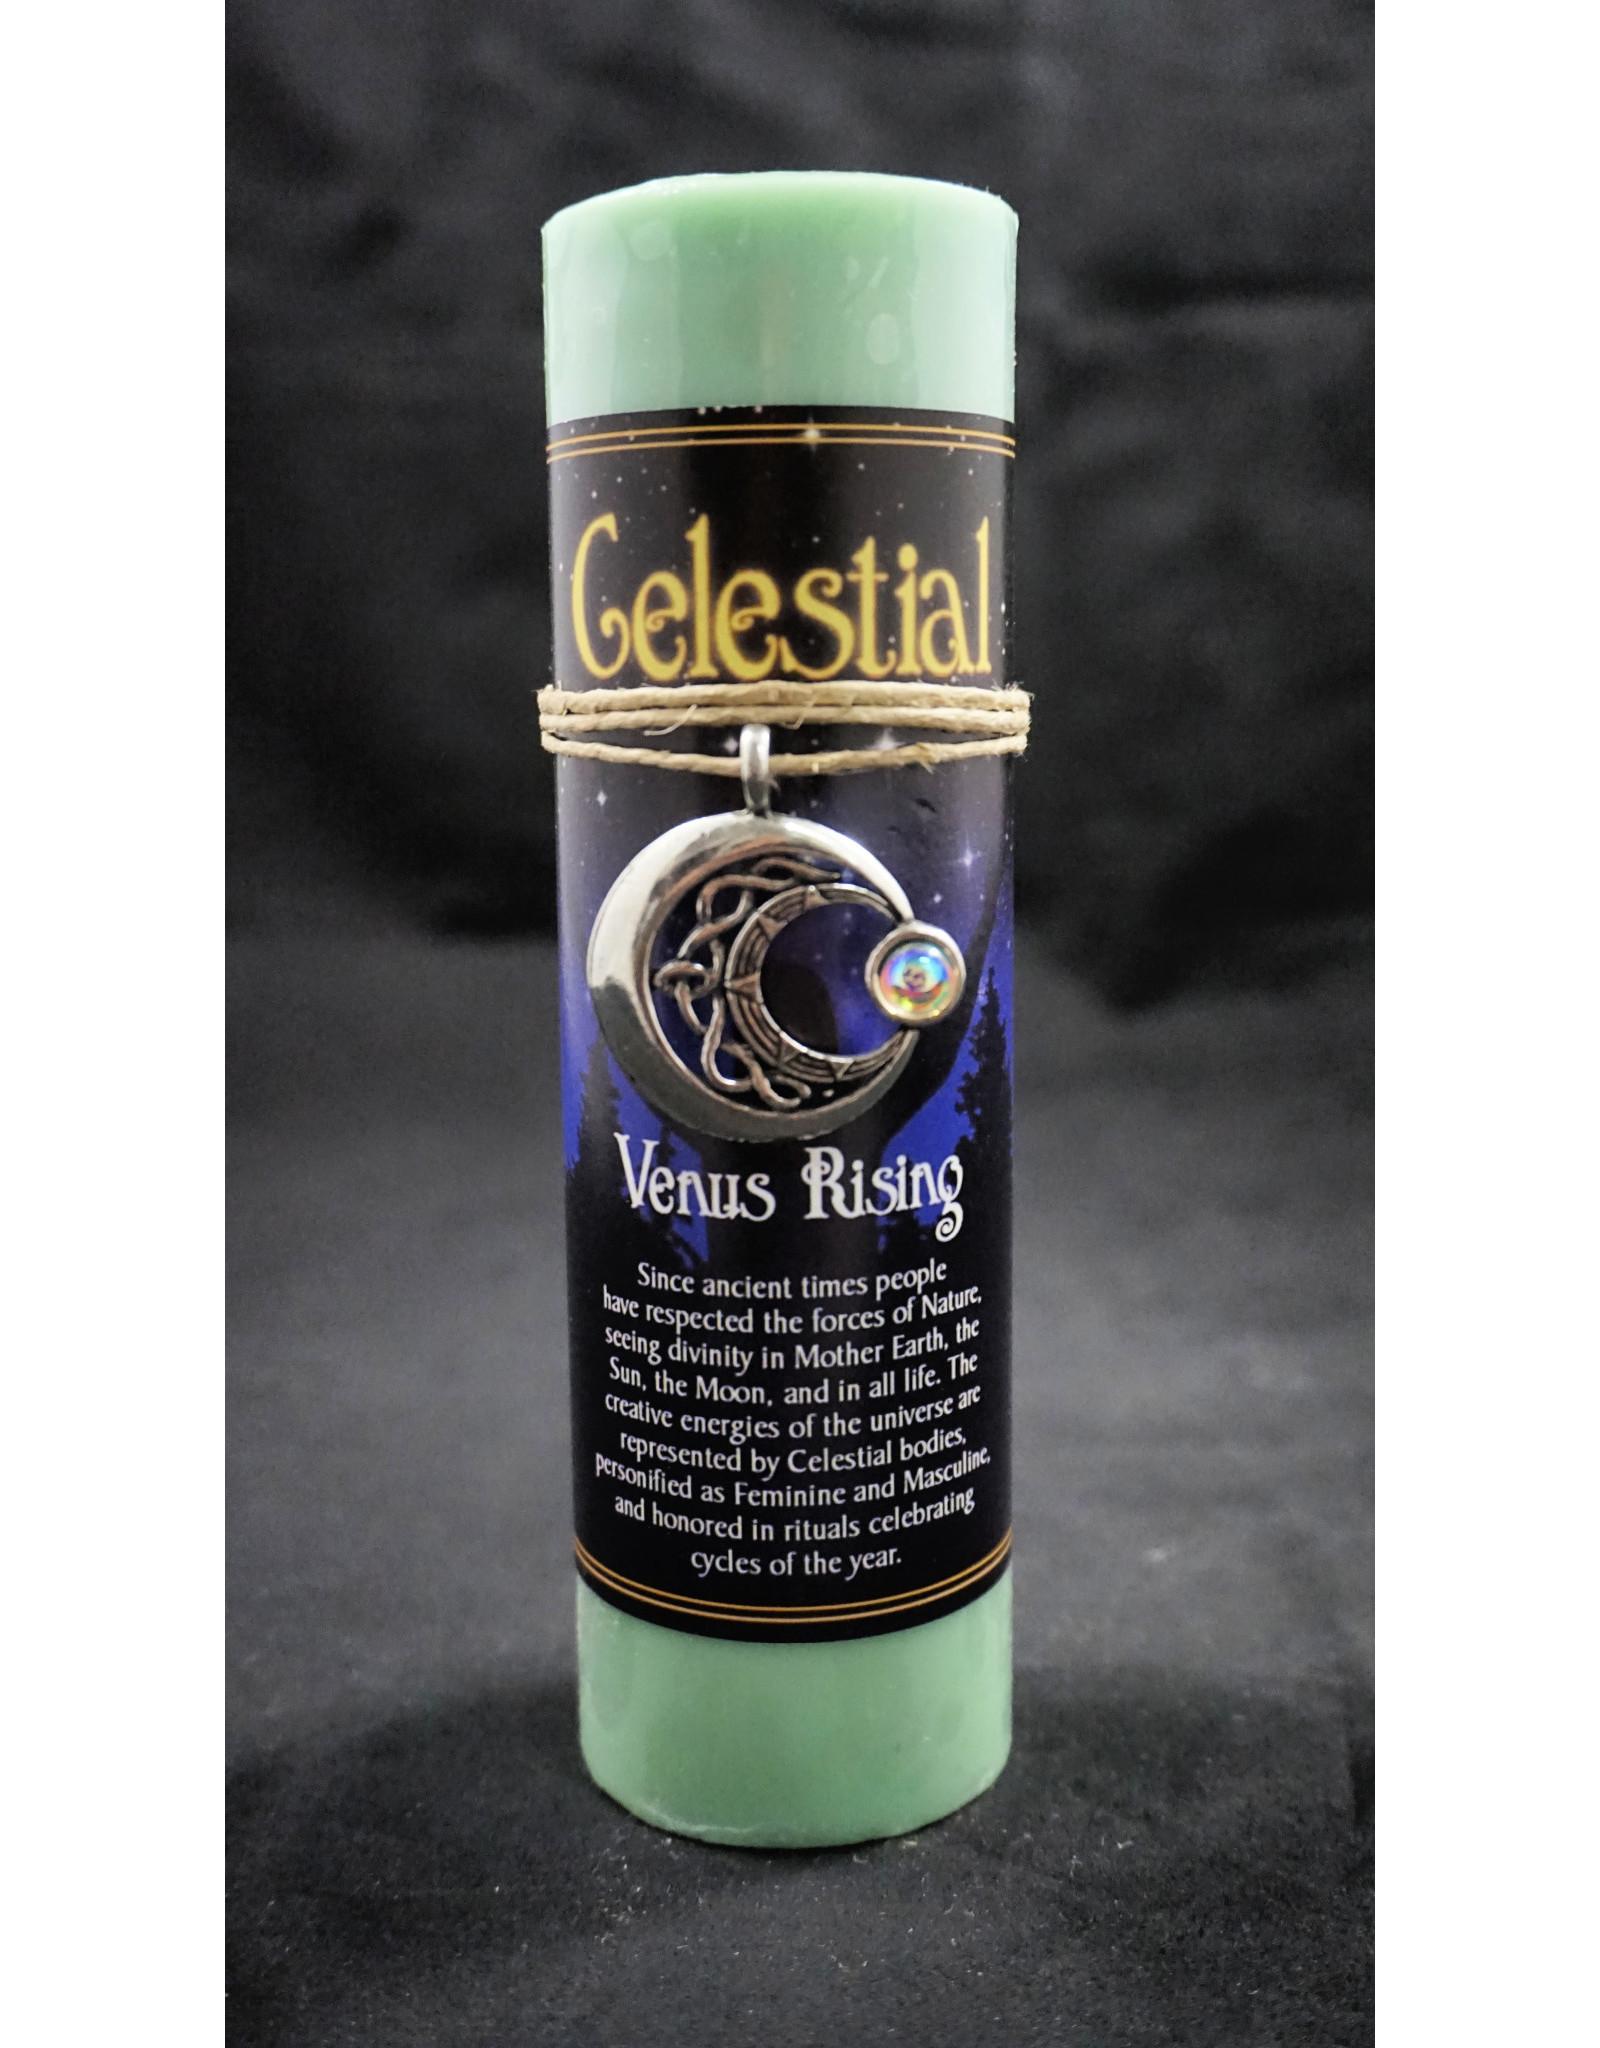 Celestial Candle Pewter Pendant - Venus Rising